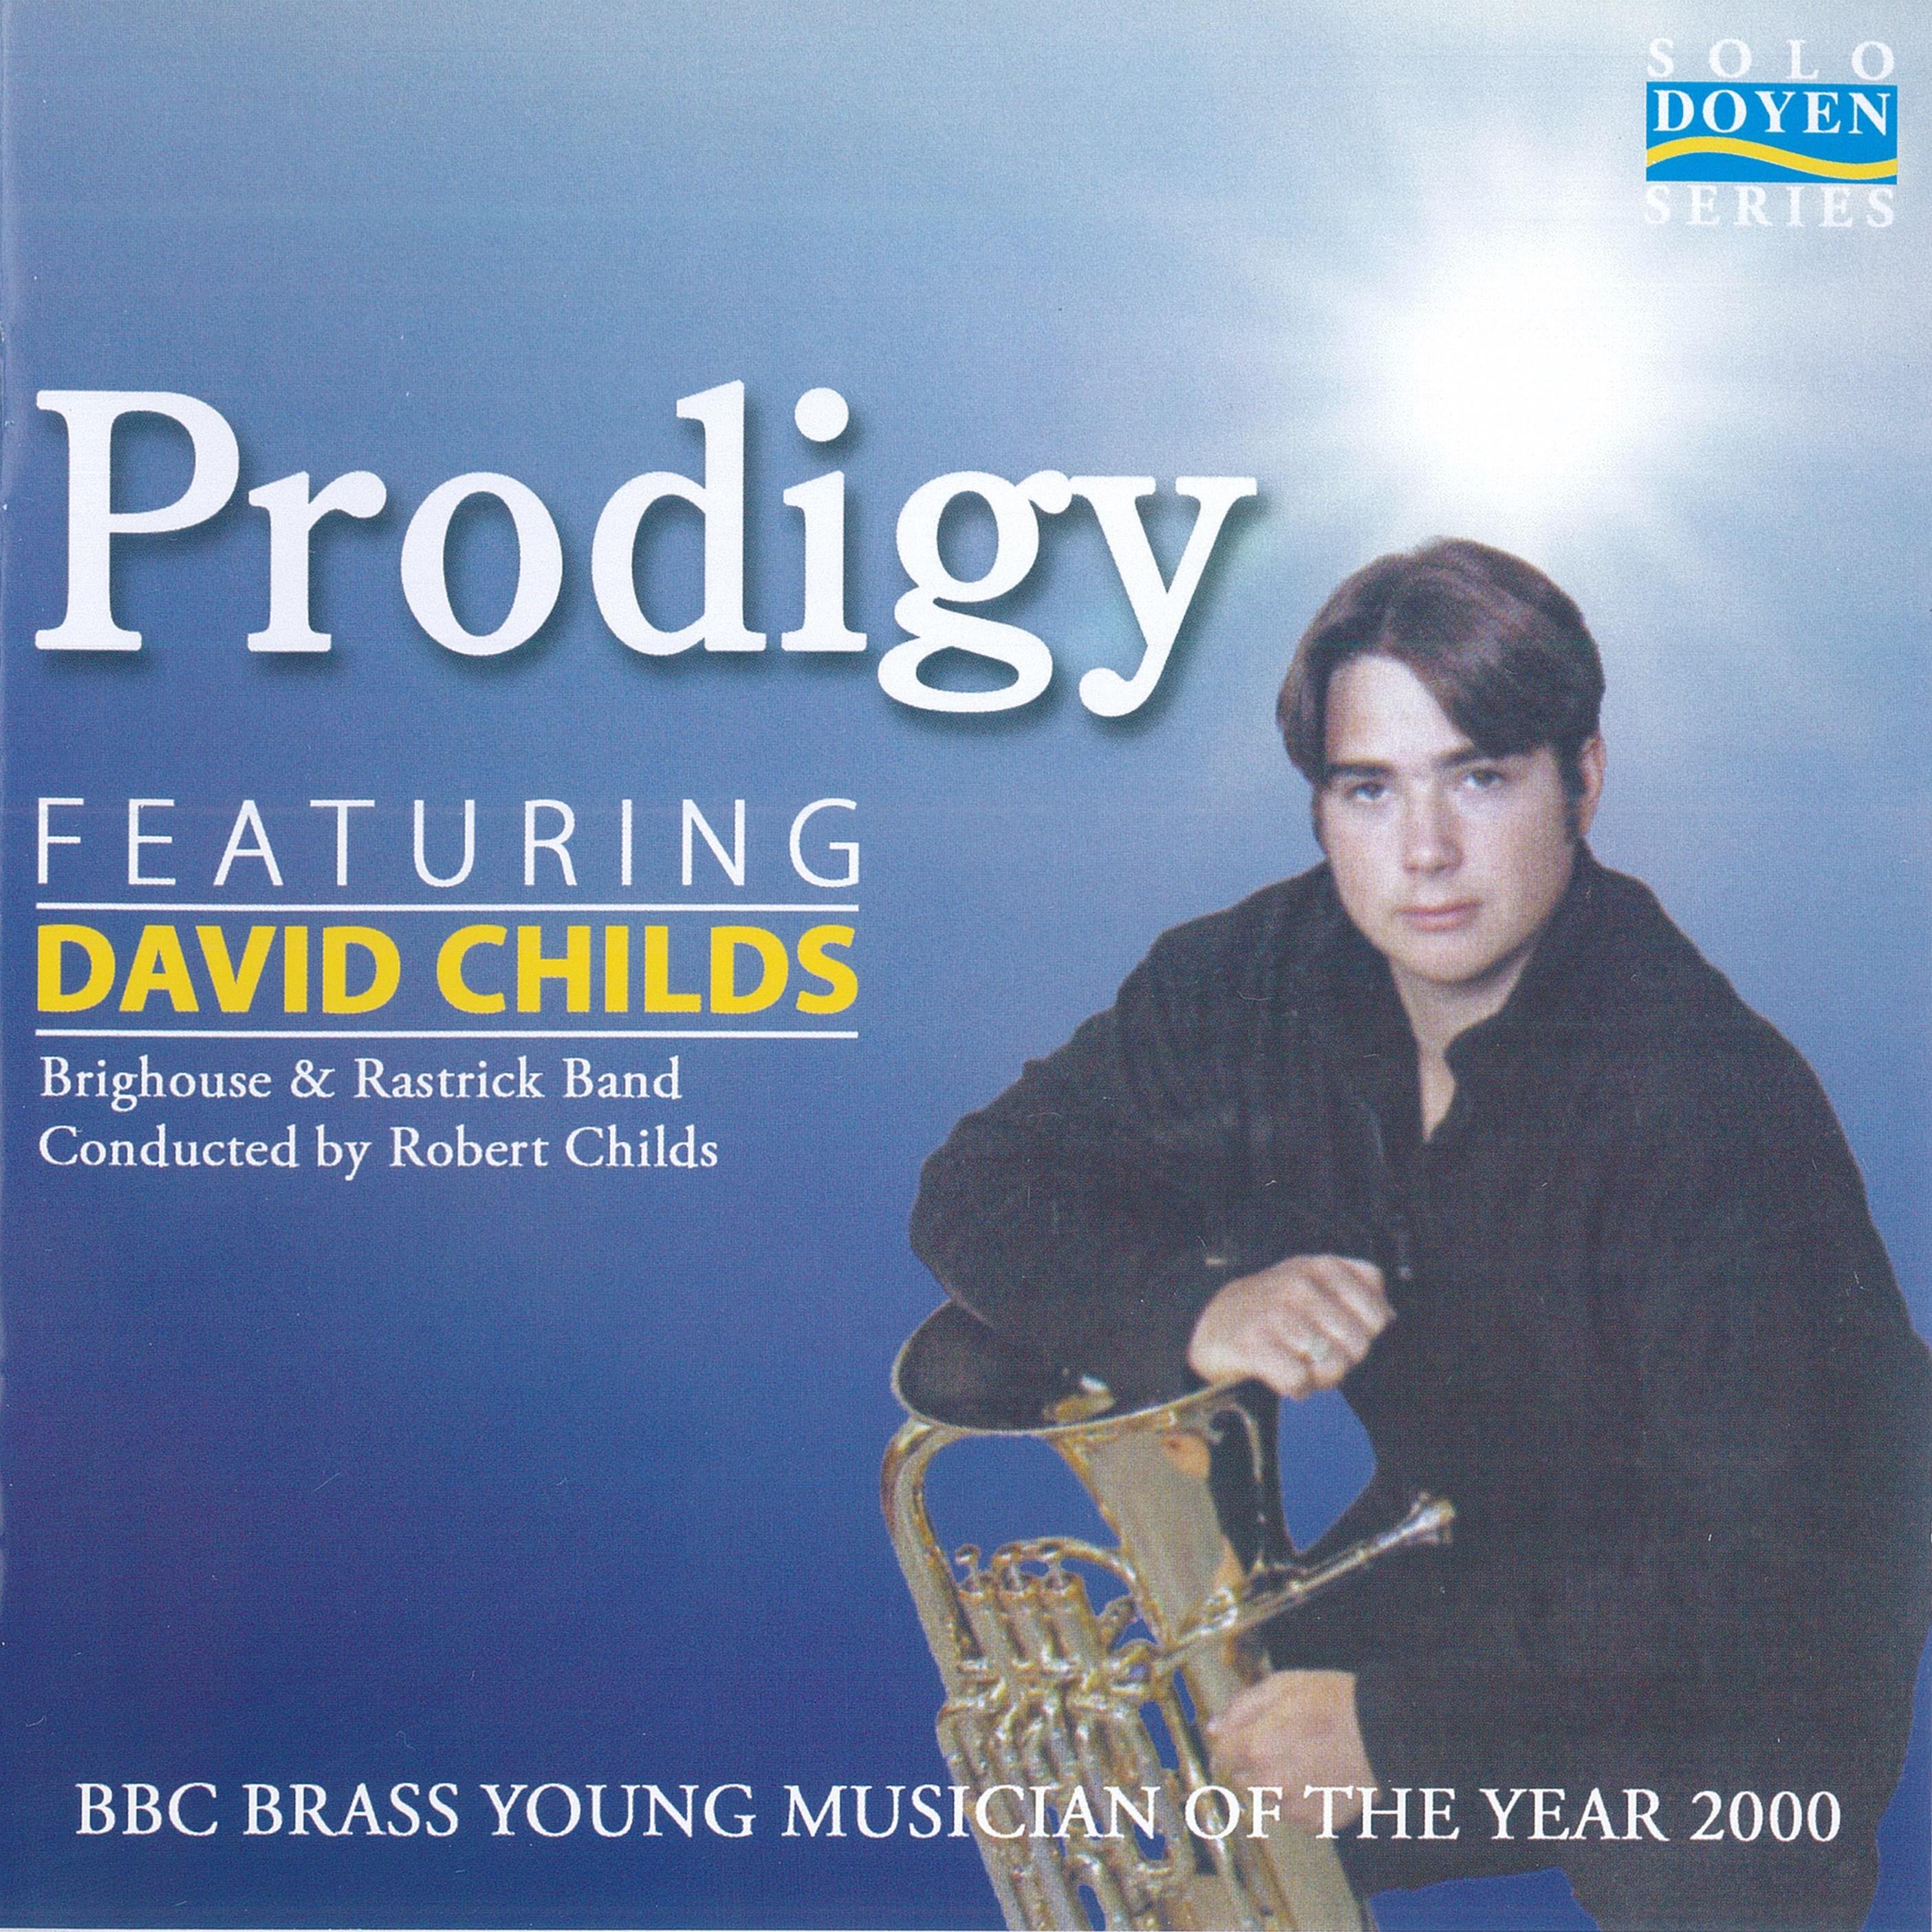 Prodigy CD - David Childs